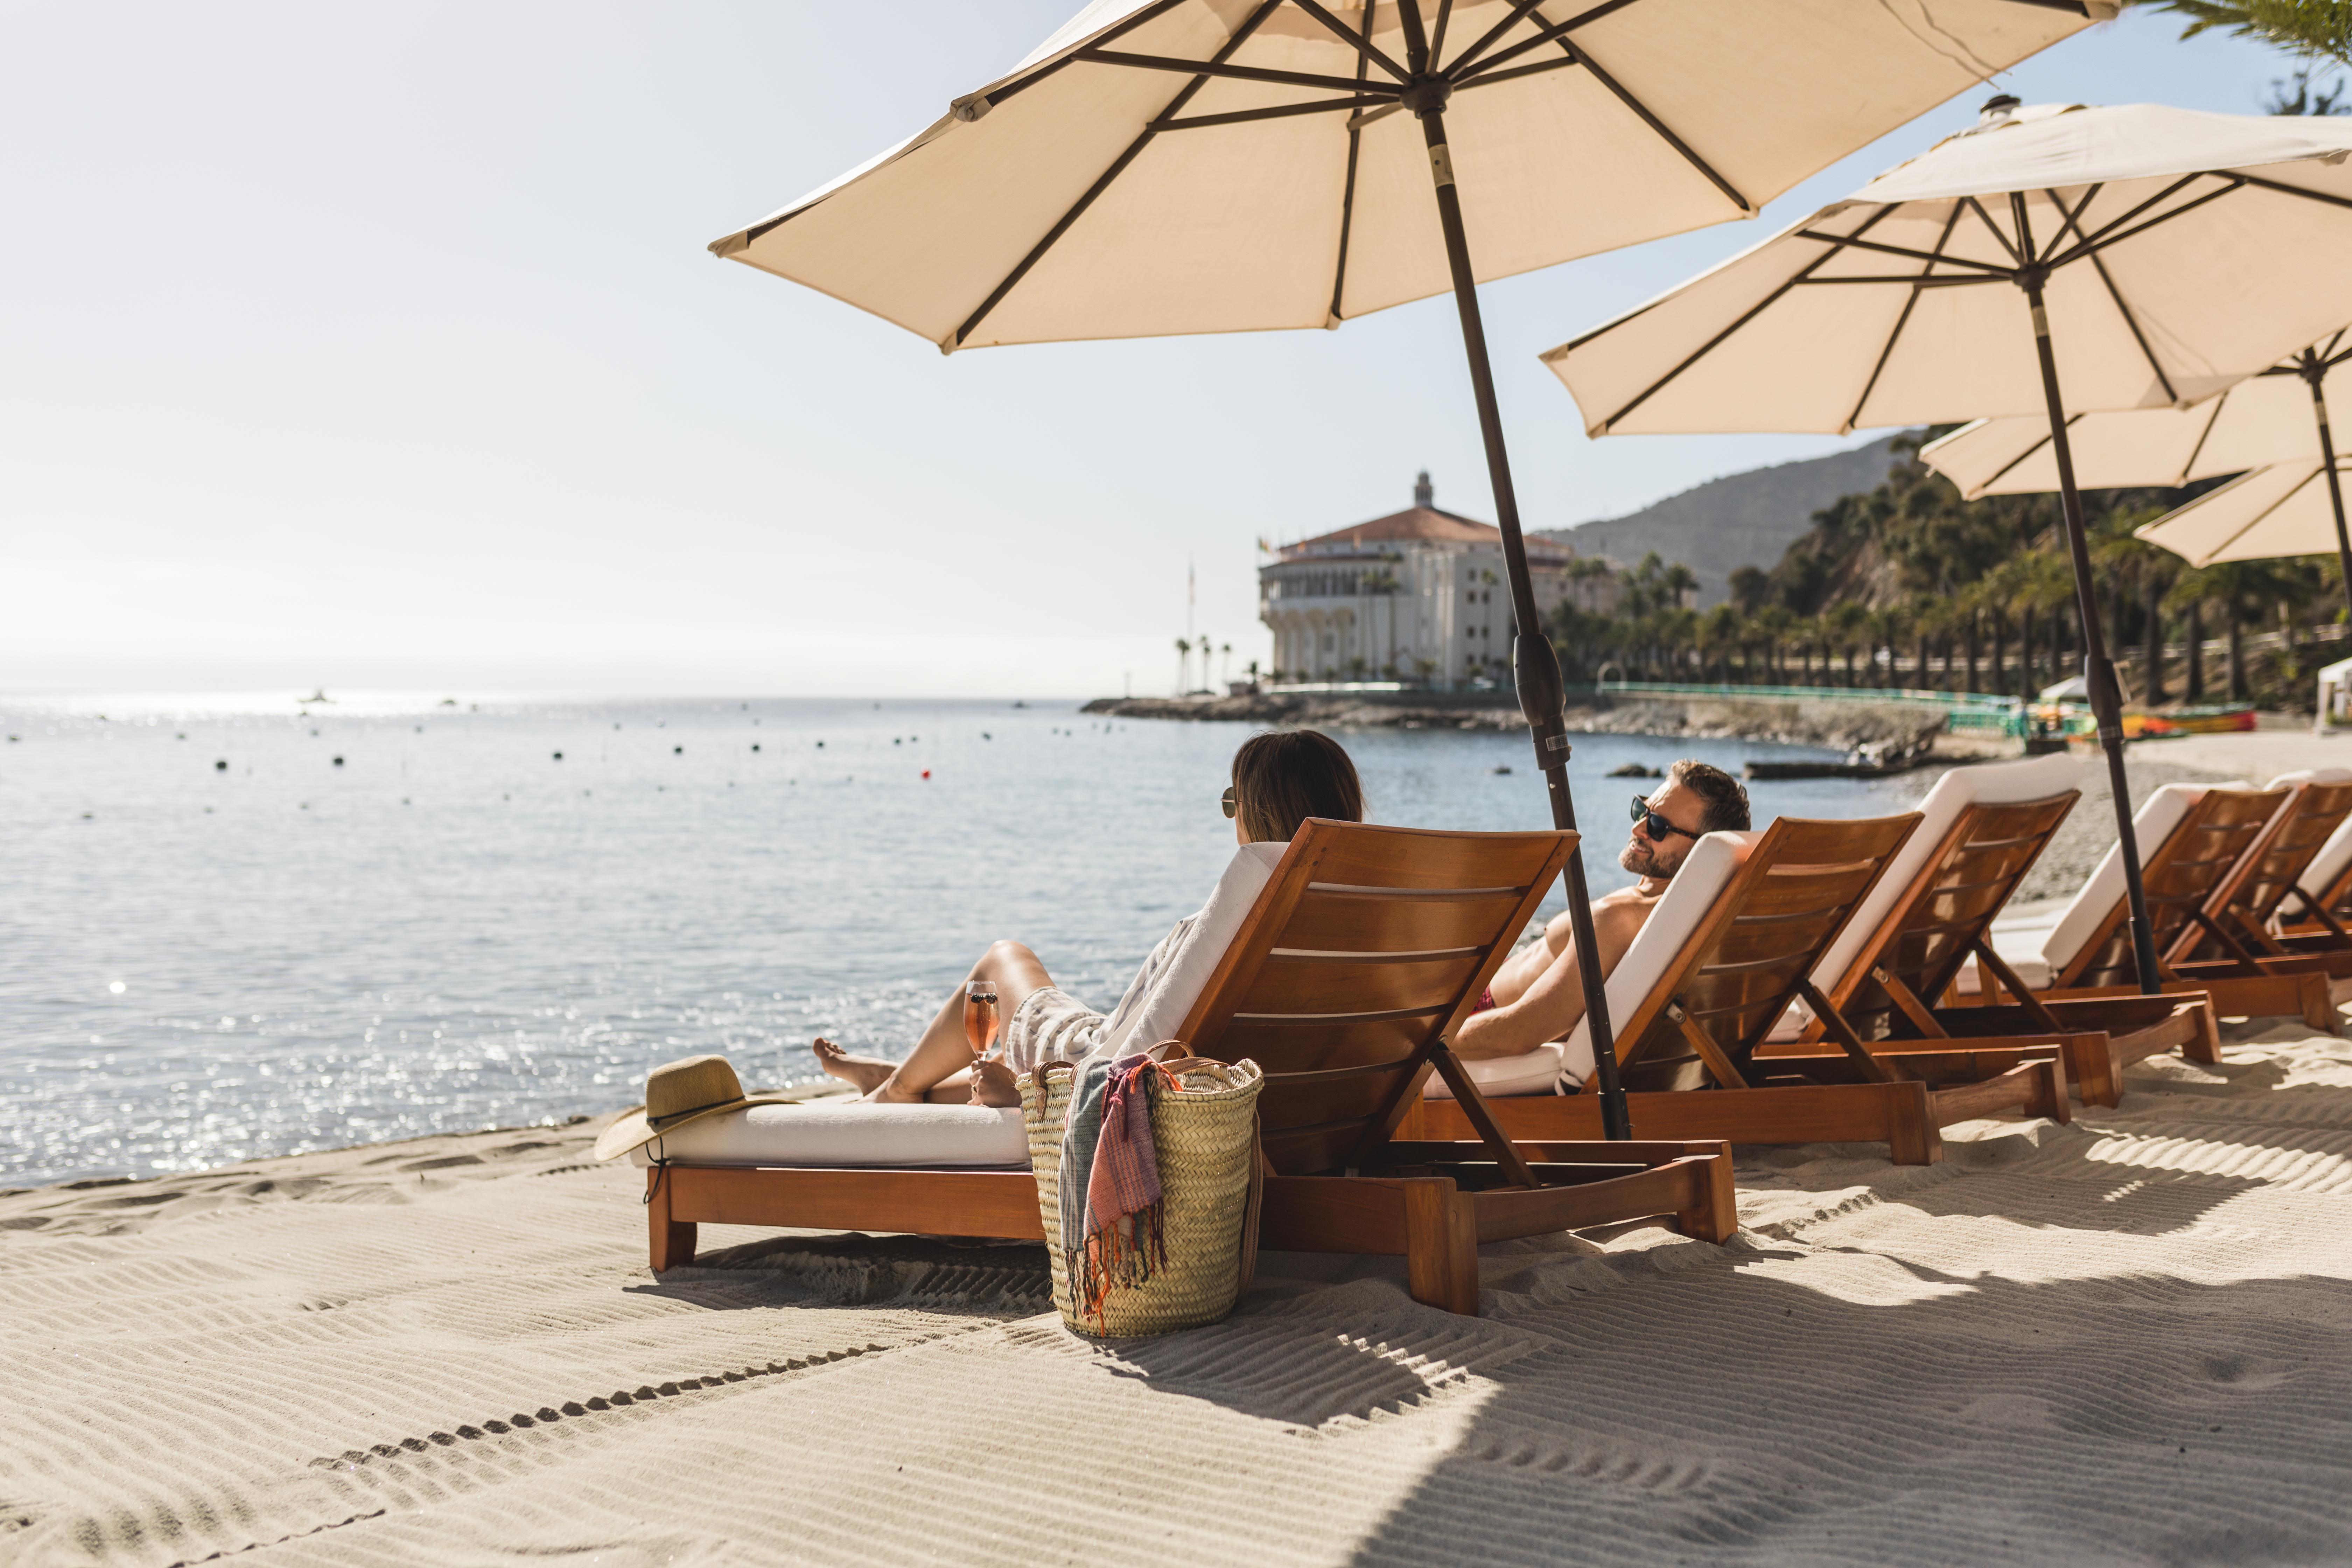 Descanso Beach Club on Catalina Island   Beach & Activities